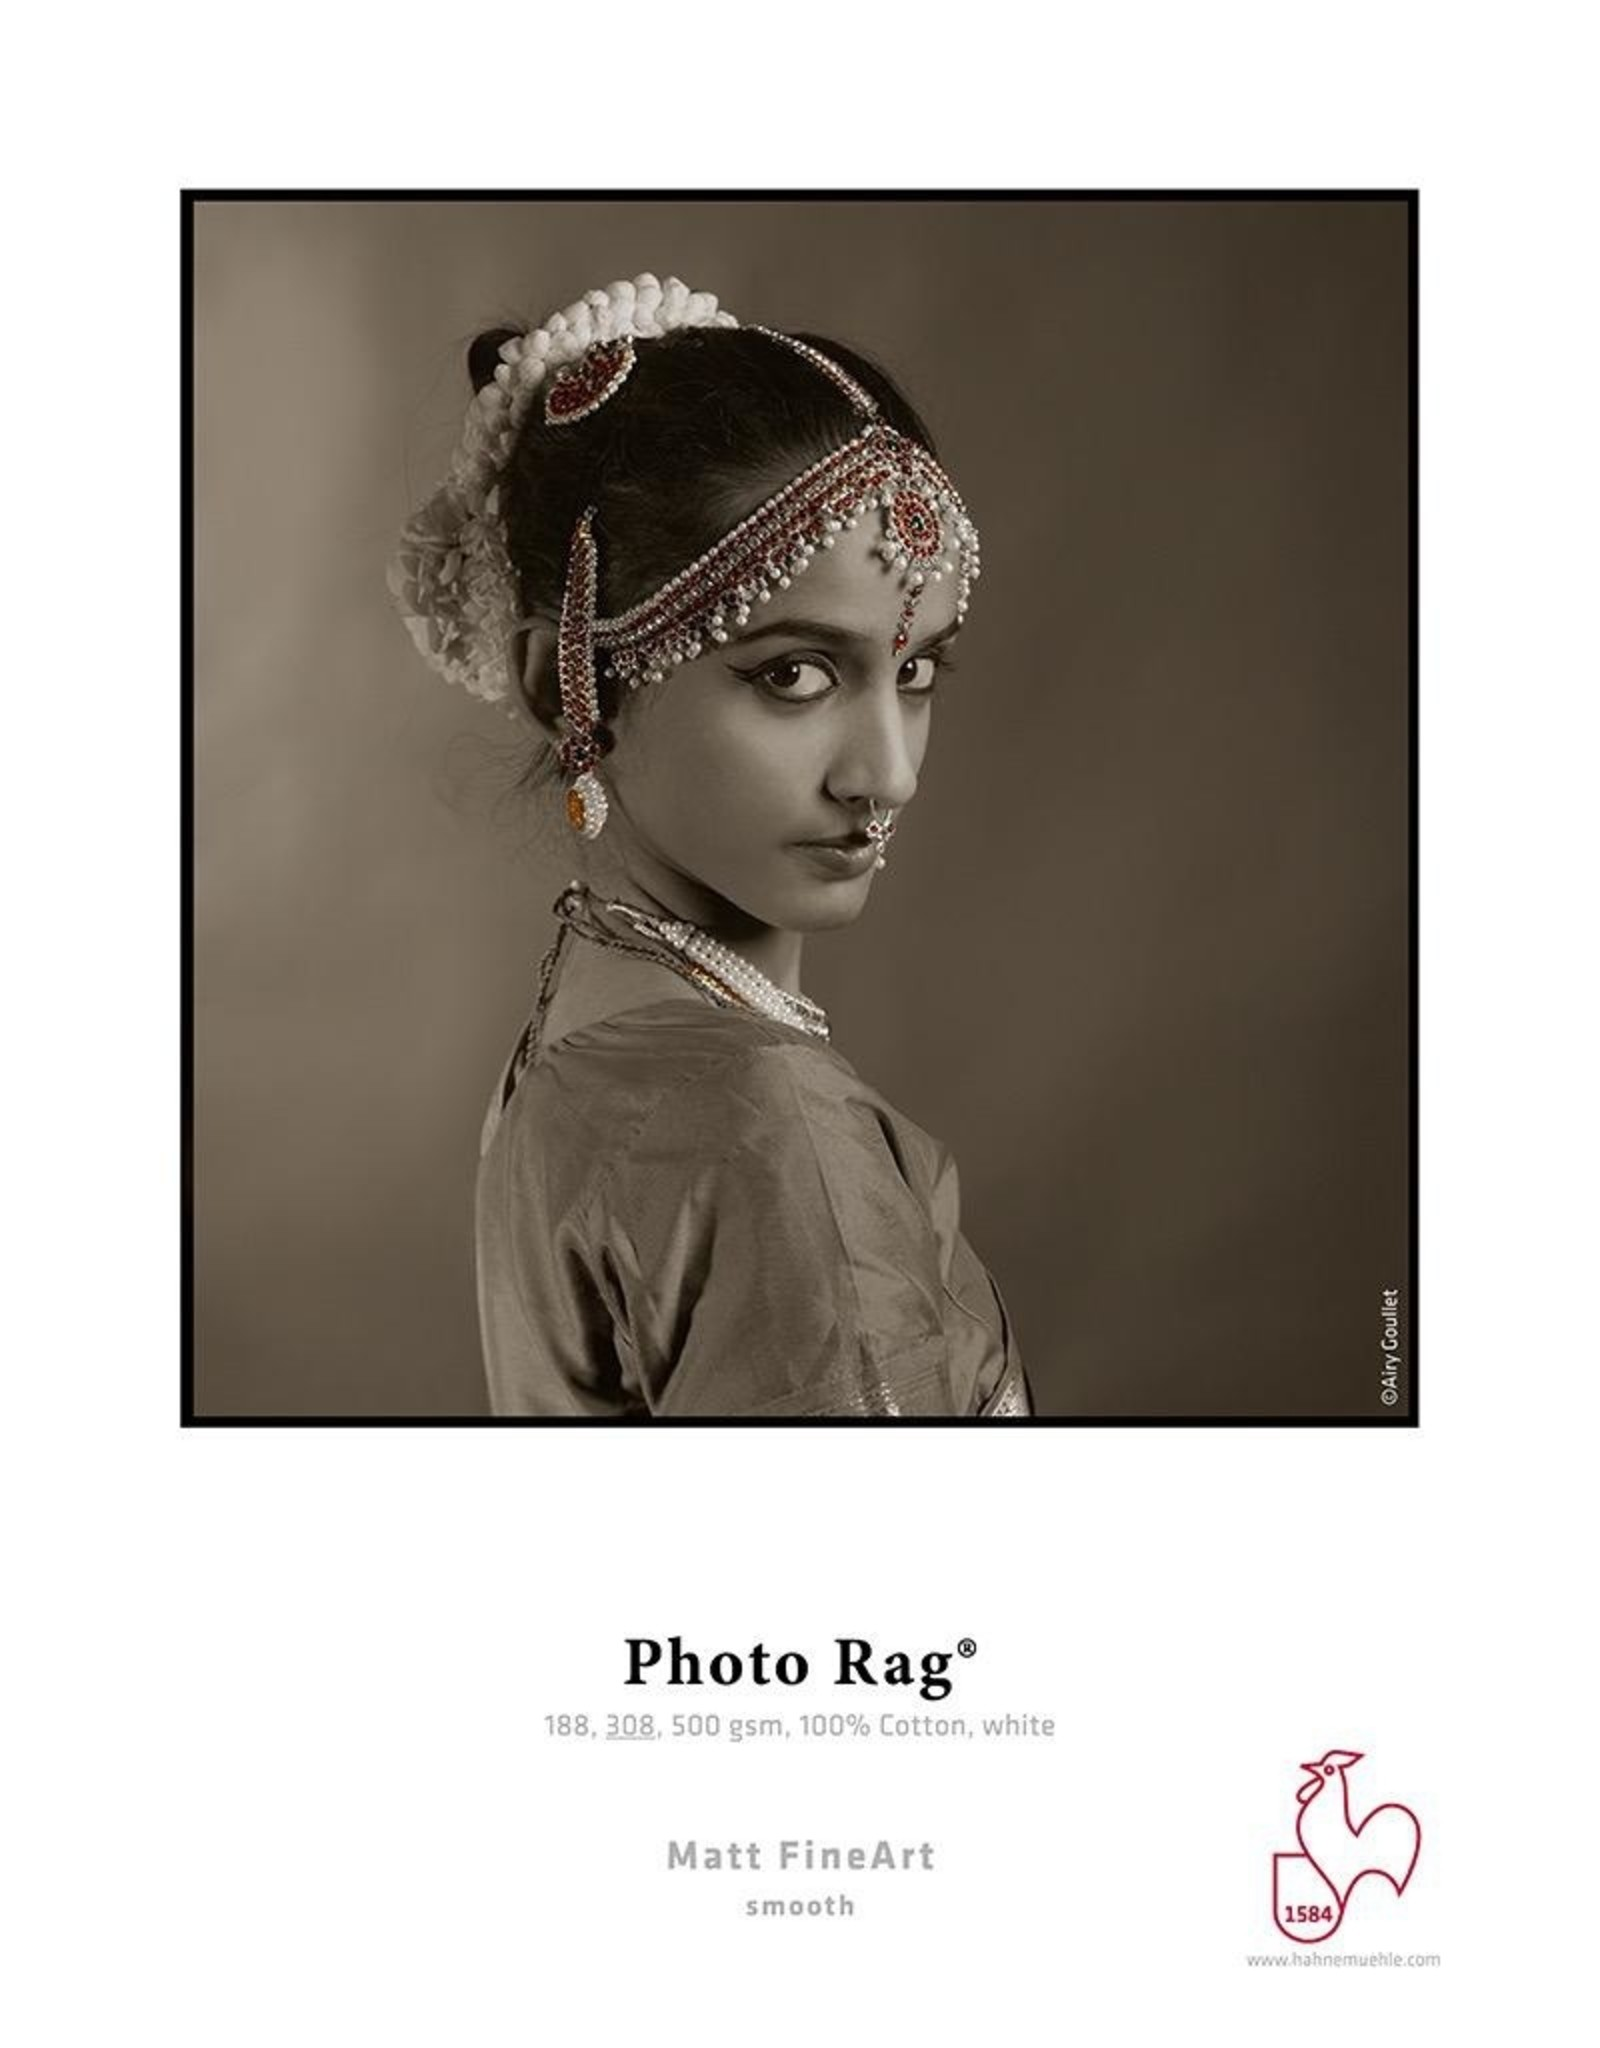 "Hahnemuhle Hahnemuhle Photo Rag® 308gsm 44"" x 39' Roll, 3"" core"